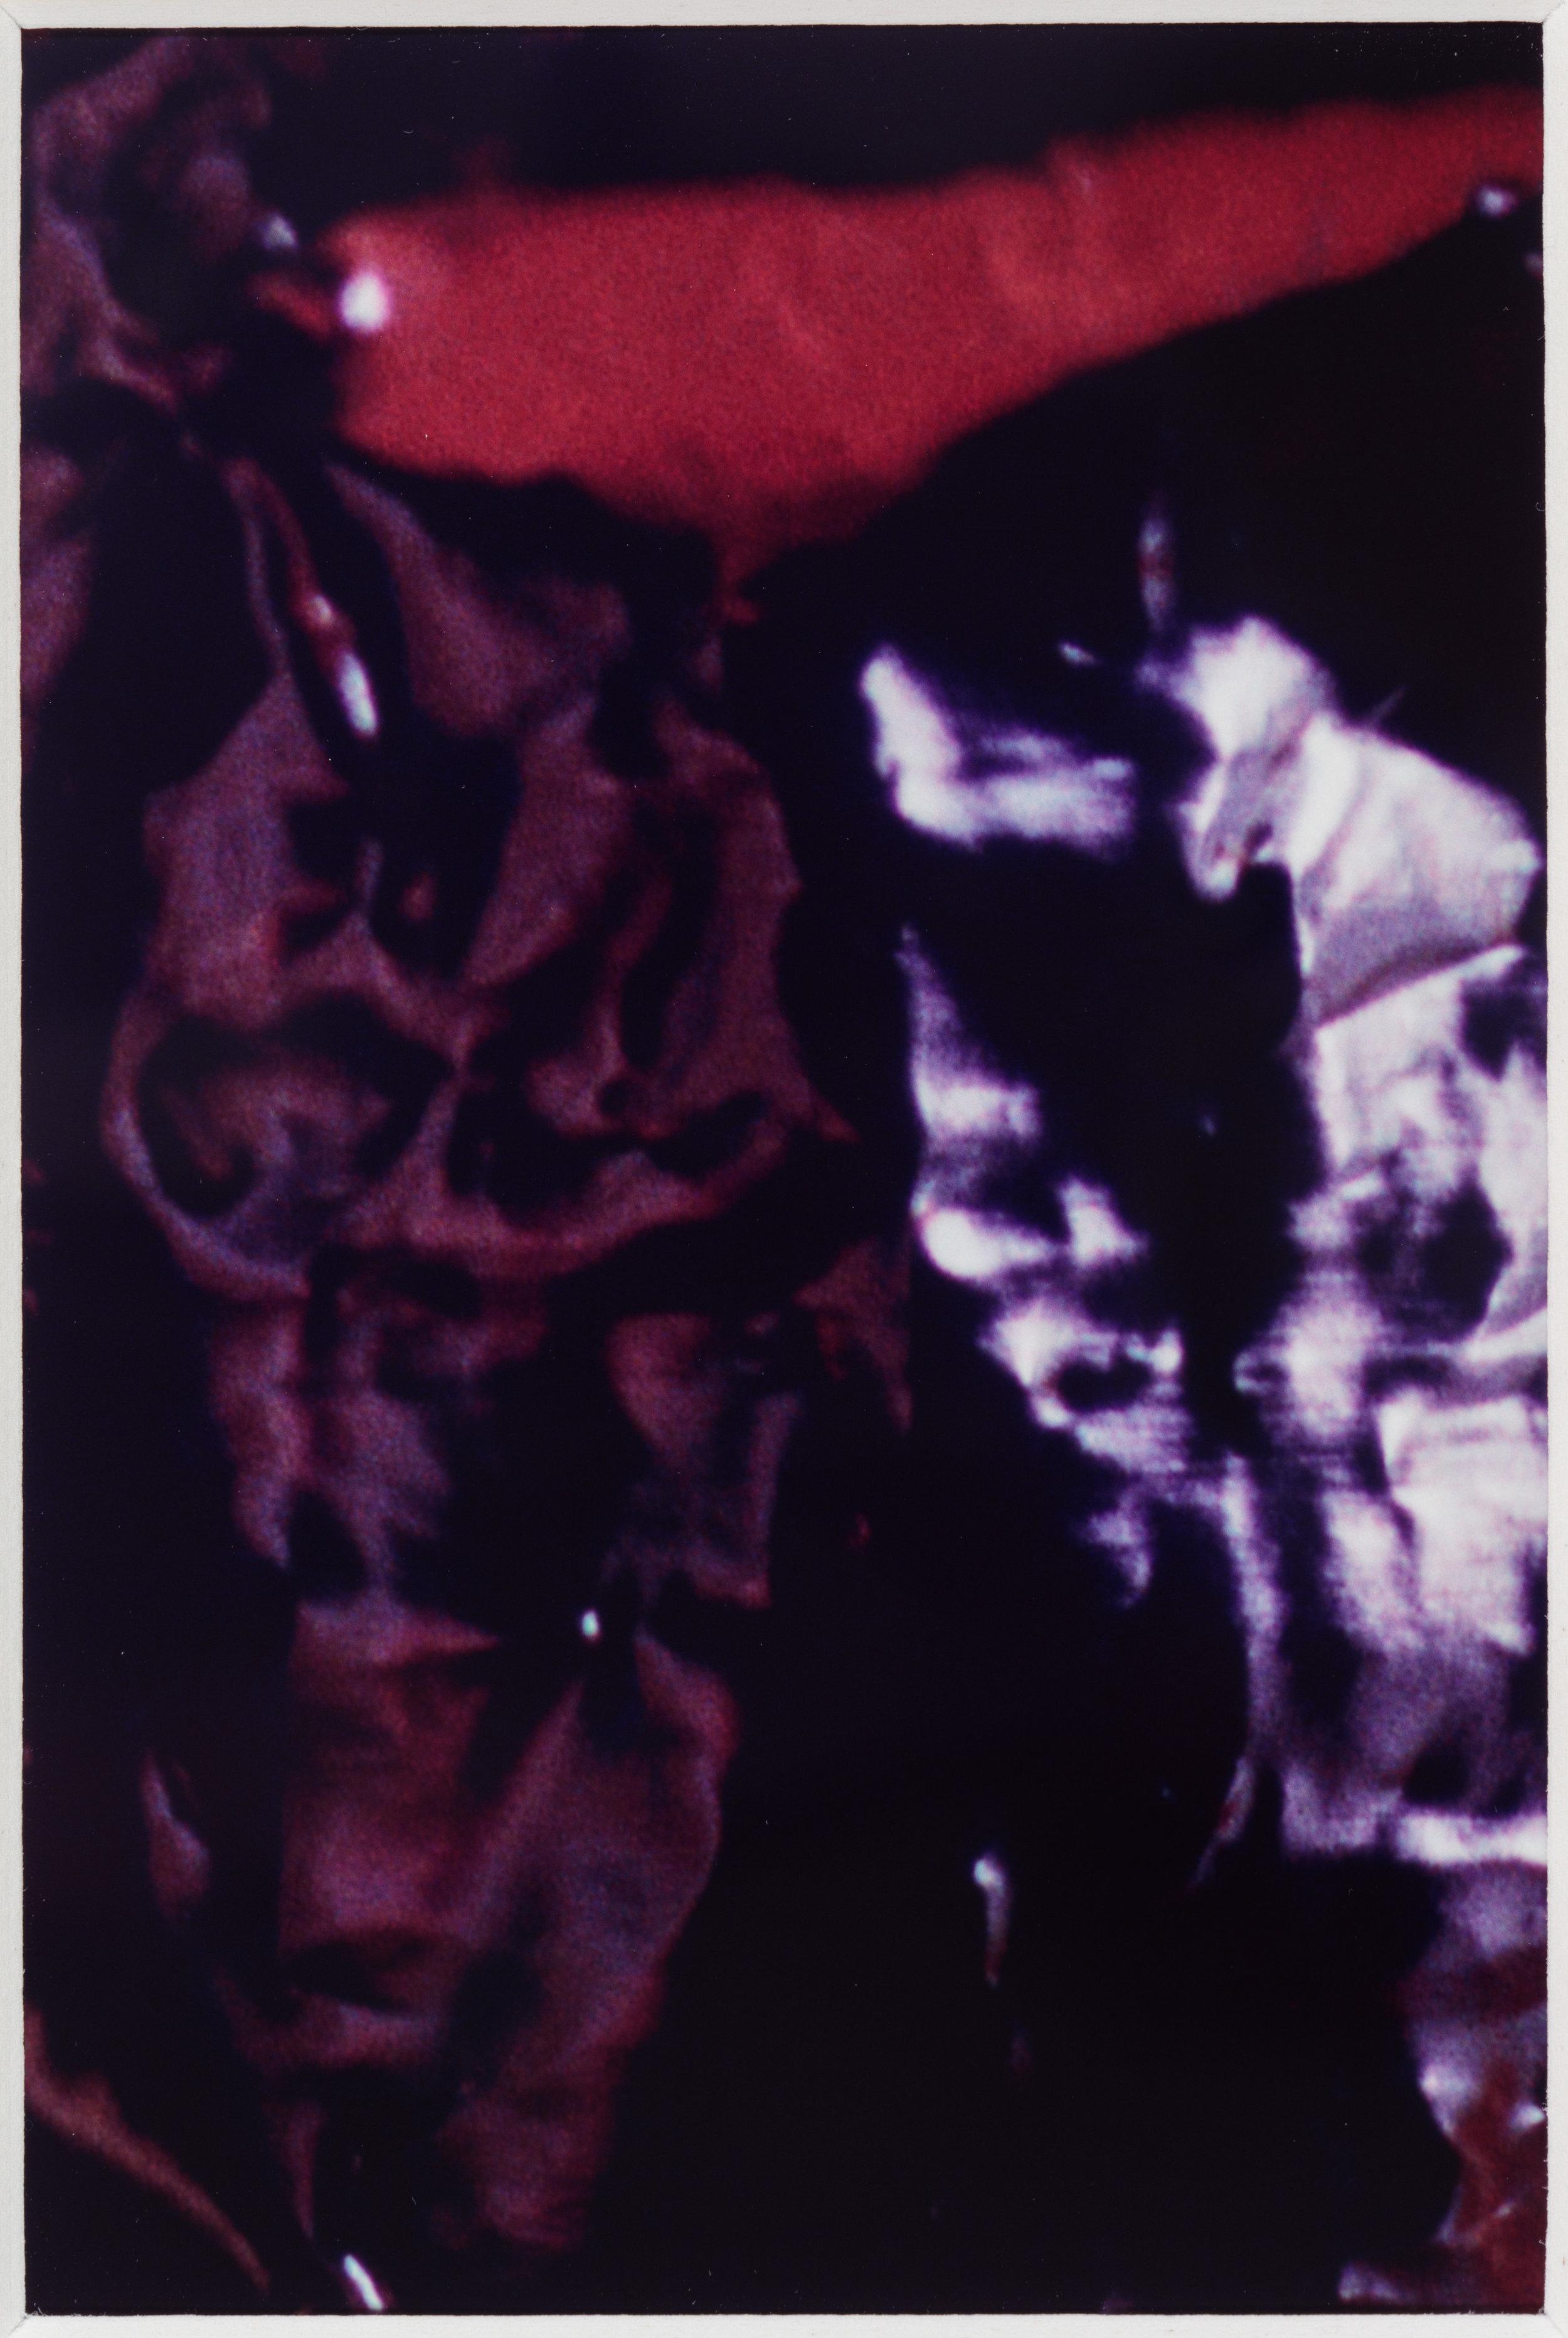 Carol Szymanski, %22Cavatina 6a: The Door Closes,%22 2017, 4.5 x 3 inches, Cibachrome unique print.jpg